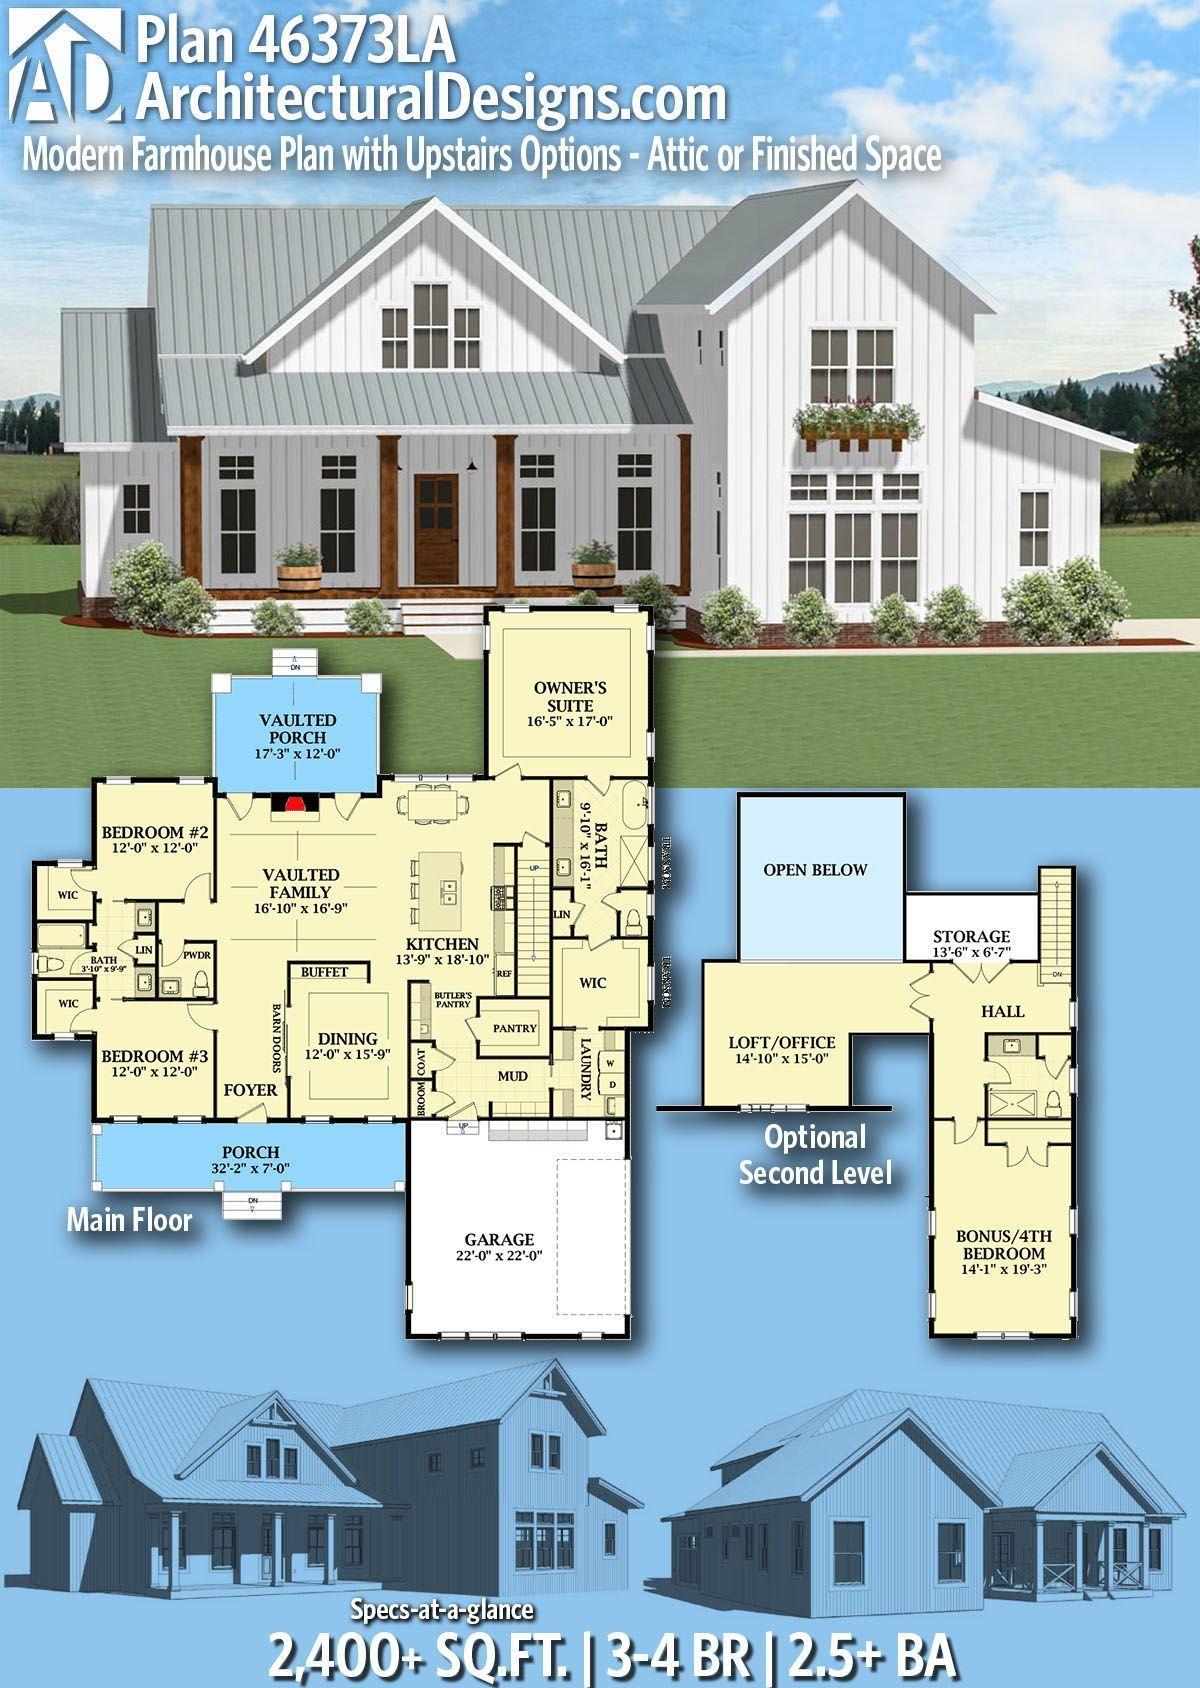 Architectural designs farmhouse plan 46373la gives you 34